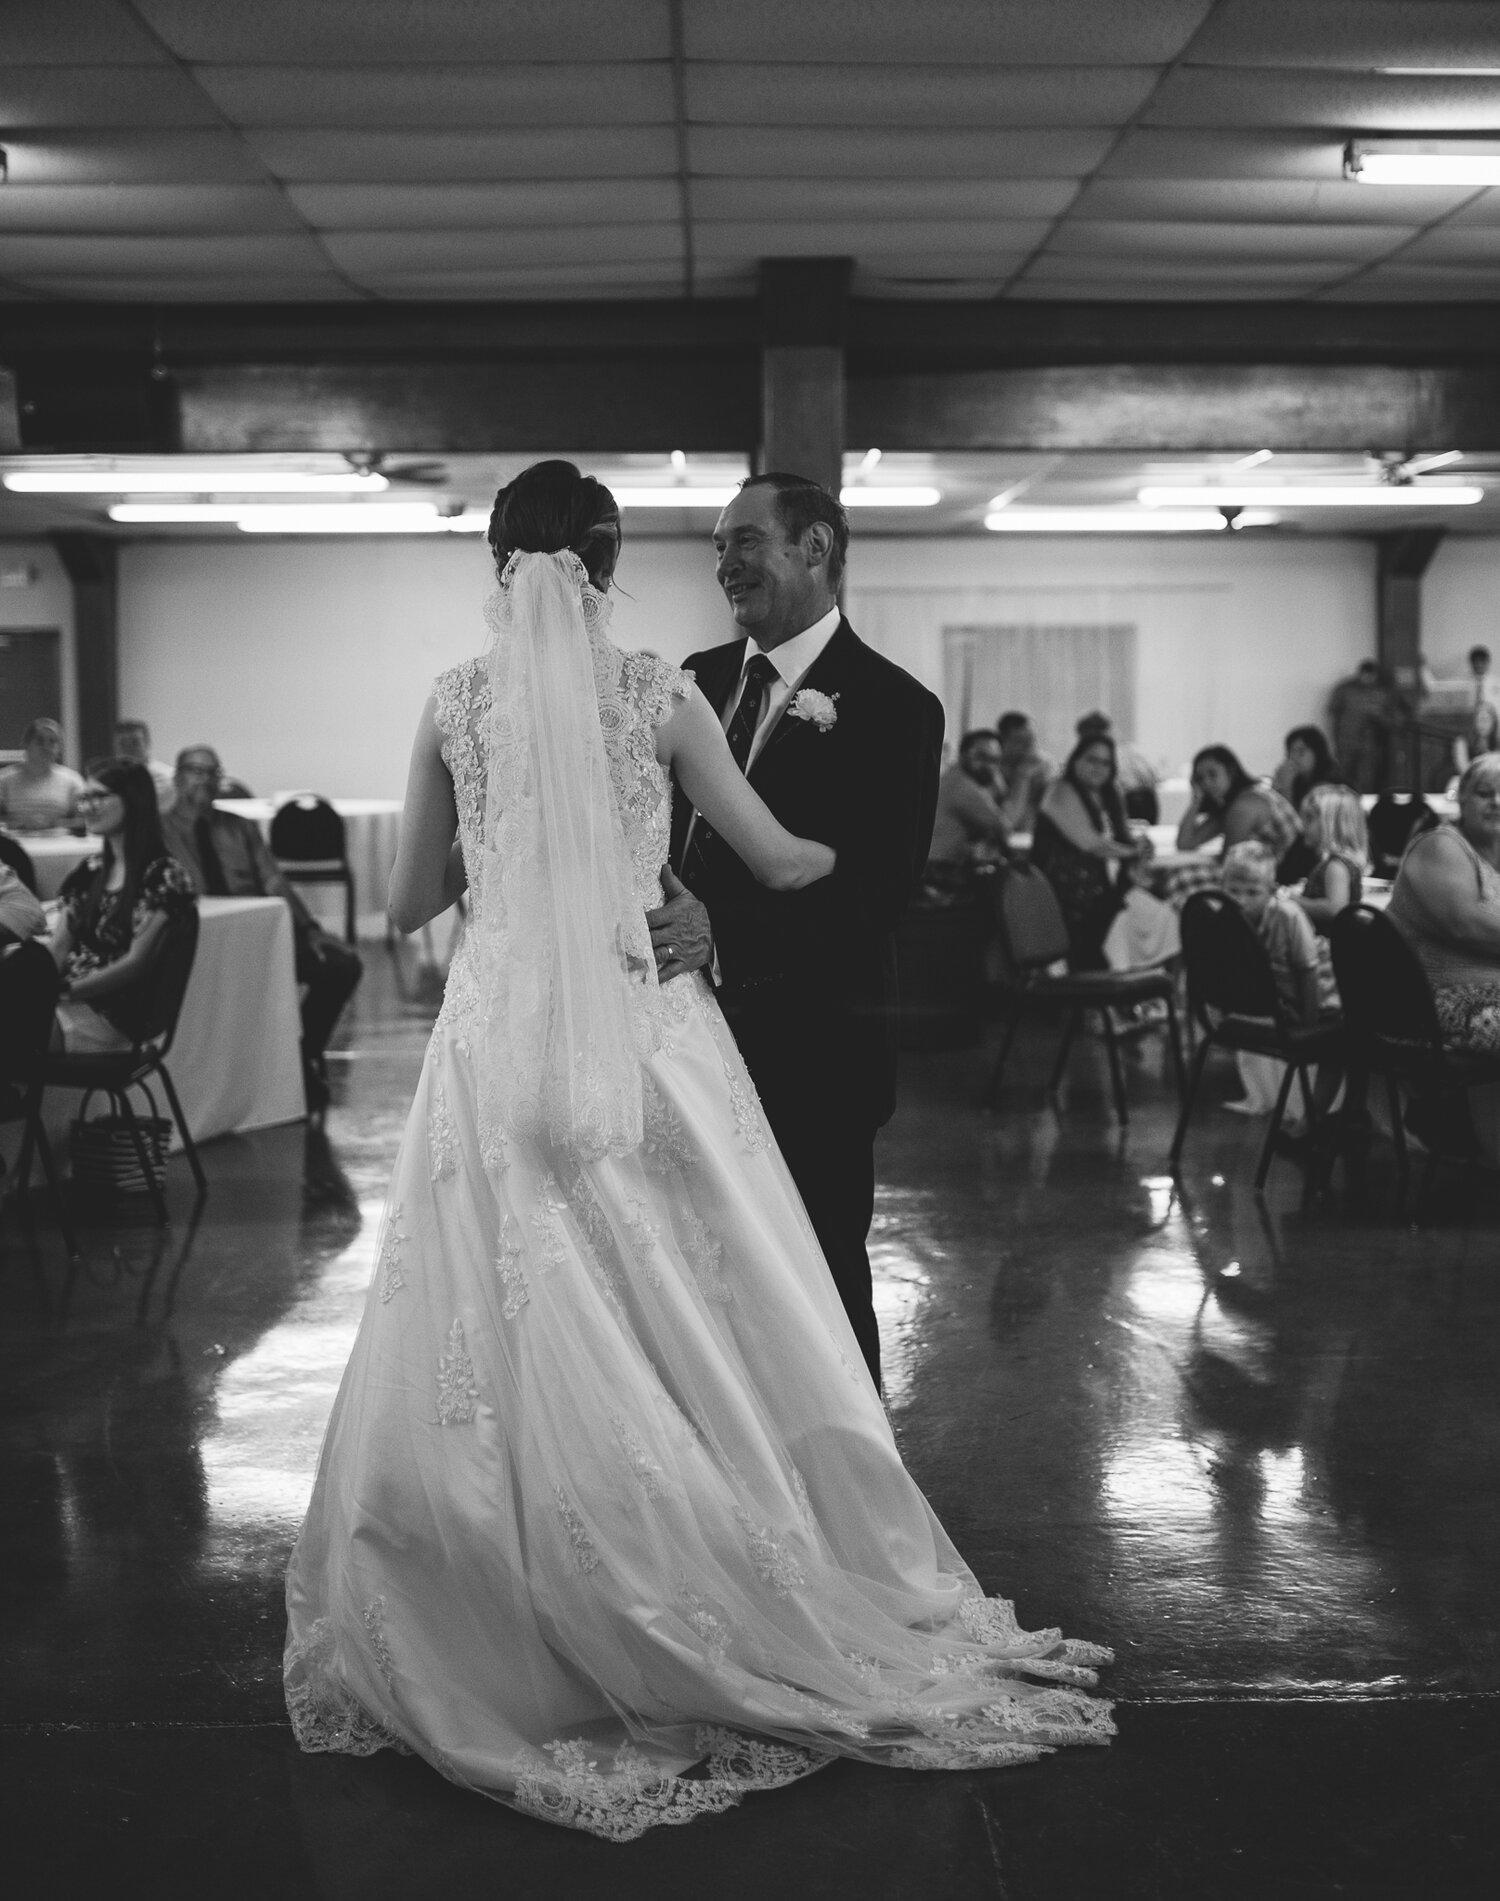 Daddy Daughter first dance